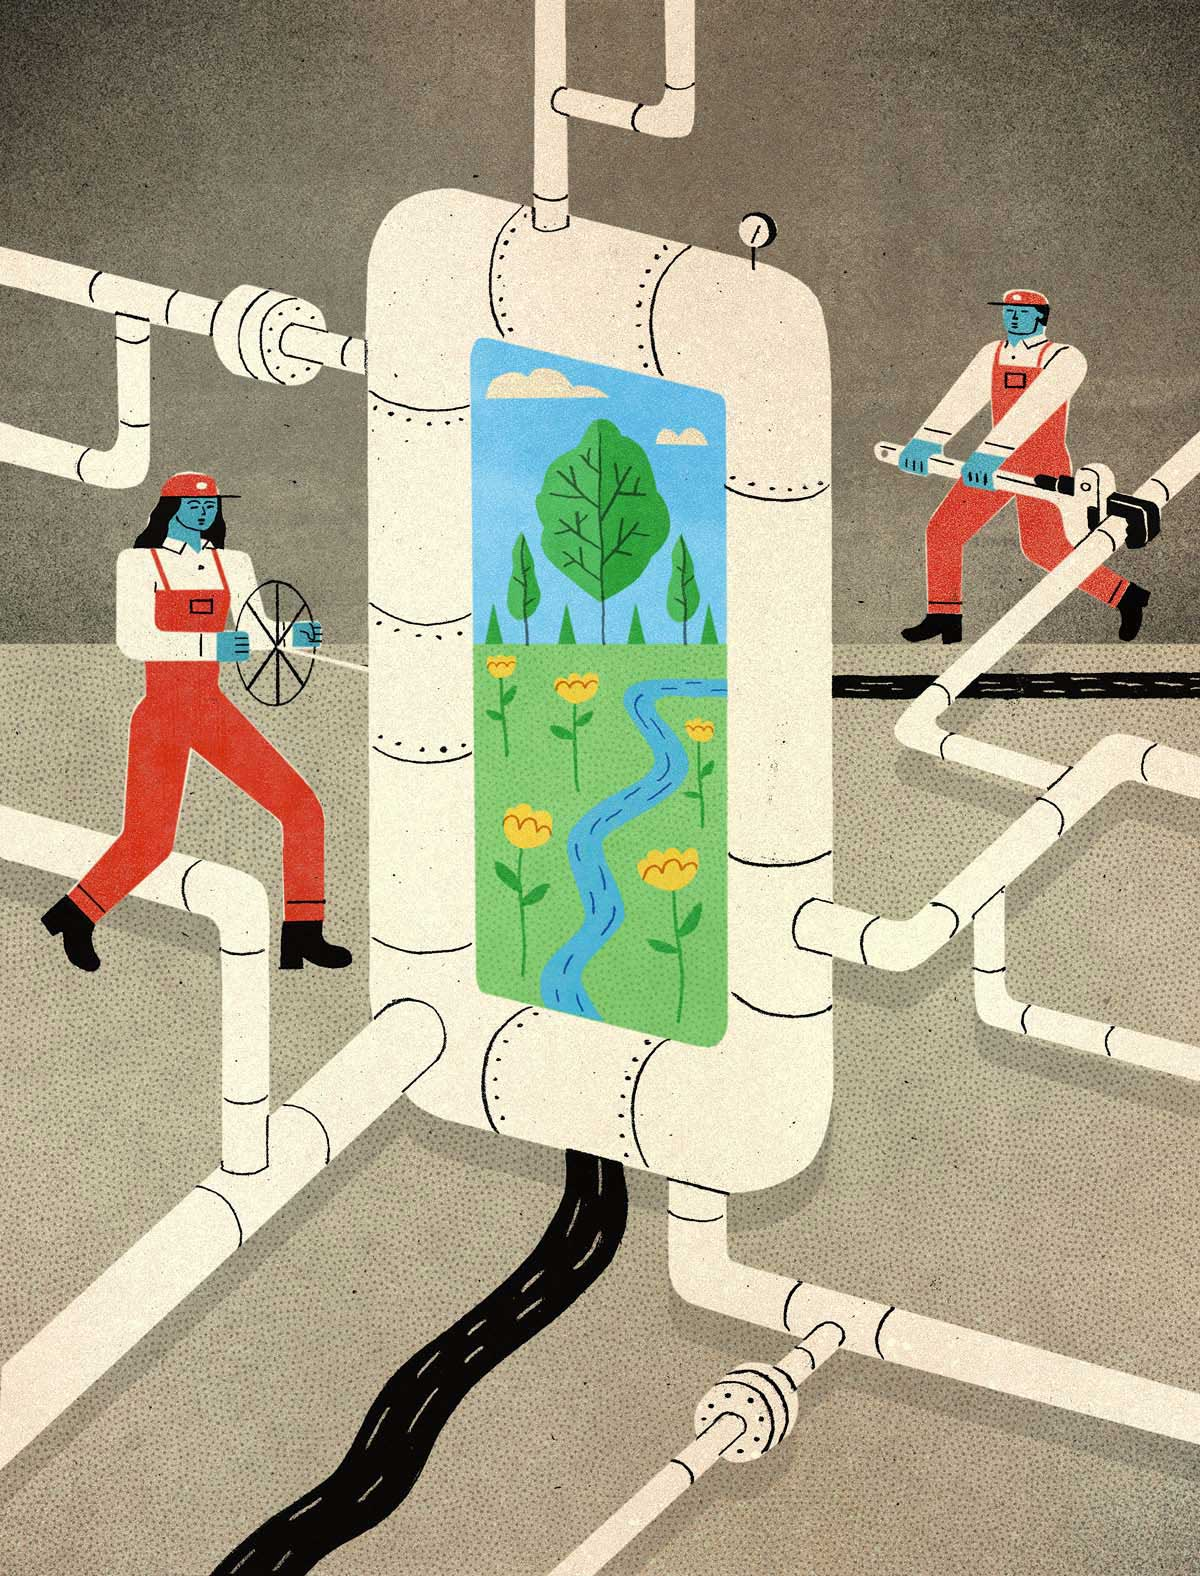 David Plunkert / Natural Gas / Low Carbon Future? / Scientific American